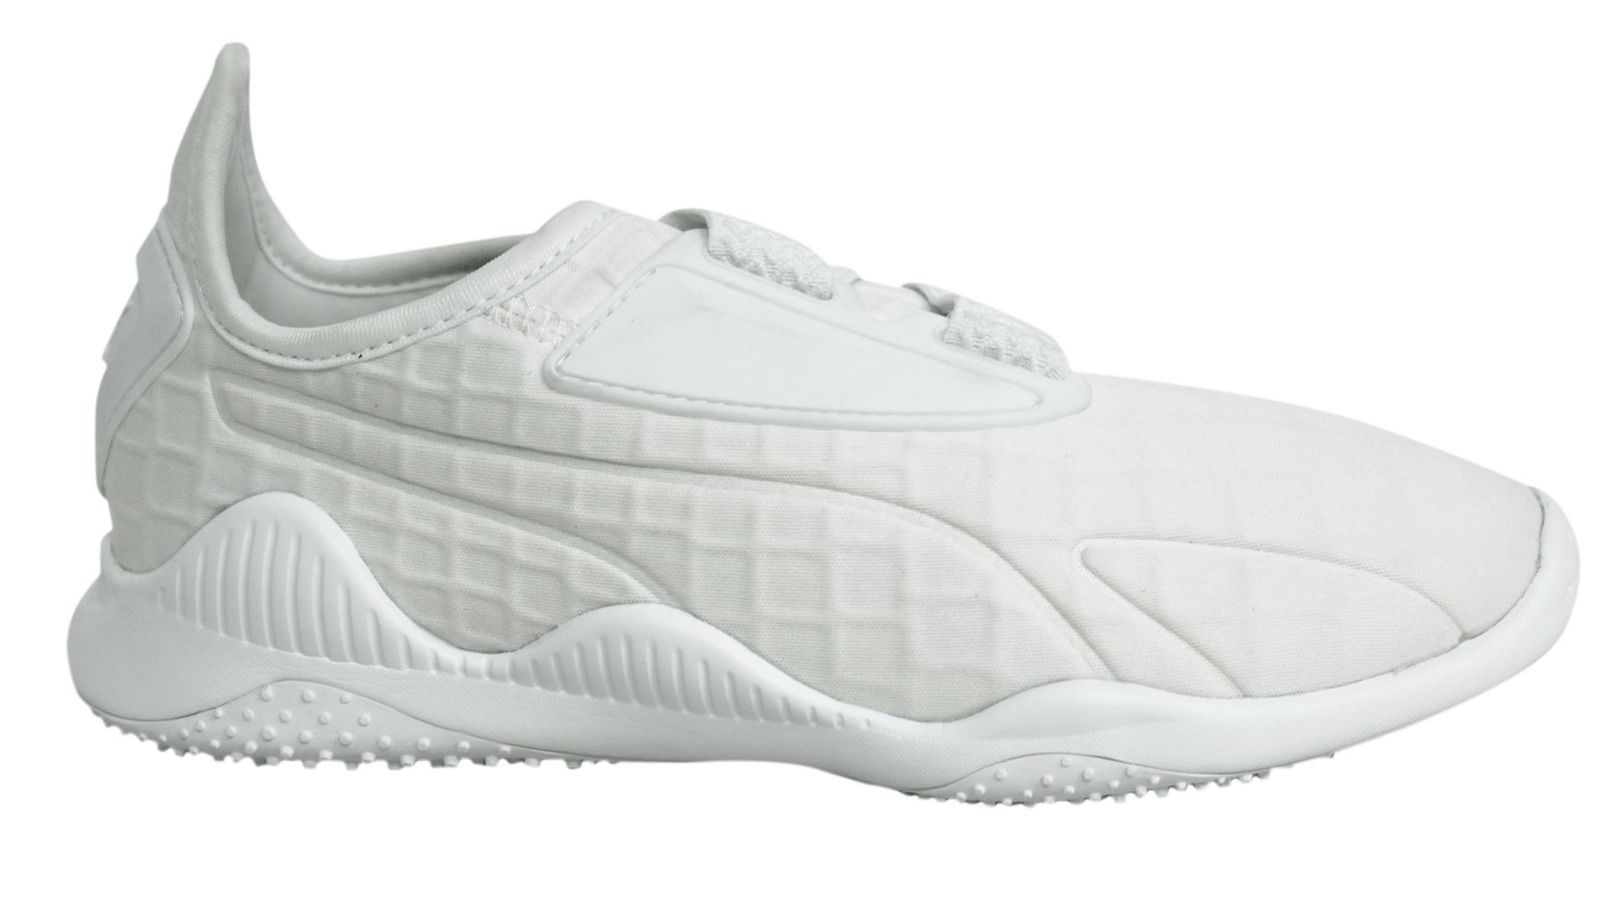 nouveau style c1f72 f4fb4 44.91   Puma Mostro Strap Up White Textile Womens Trainers ...